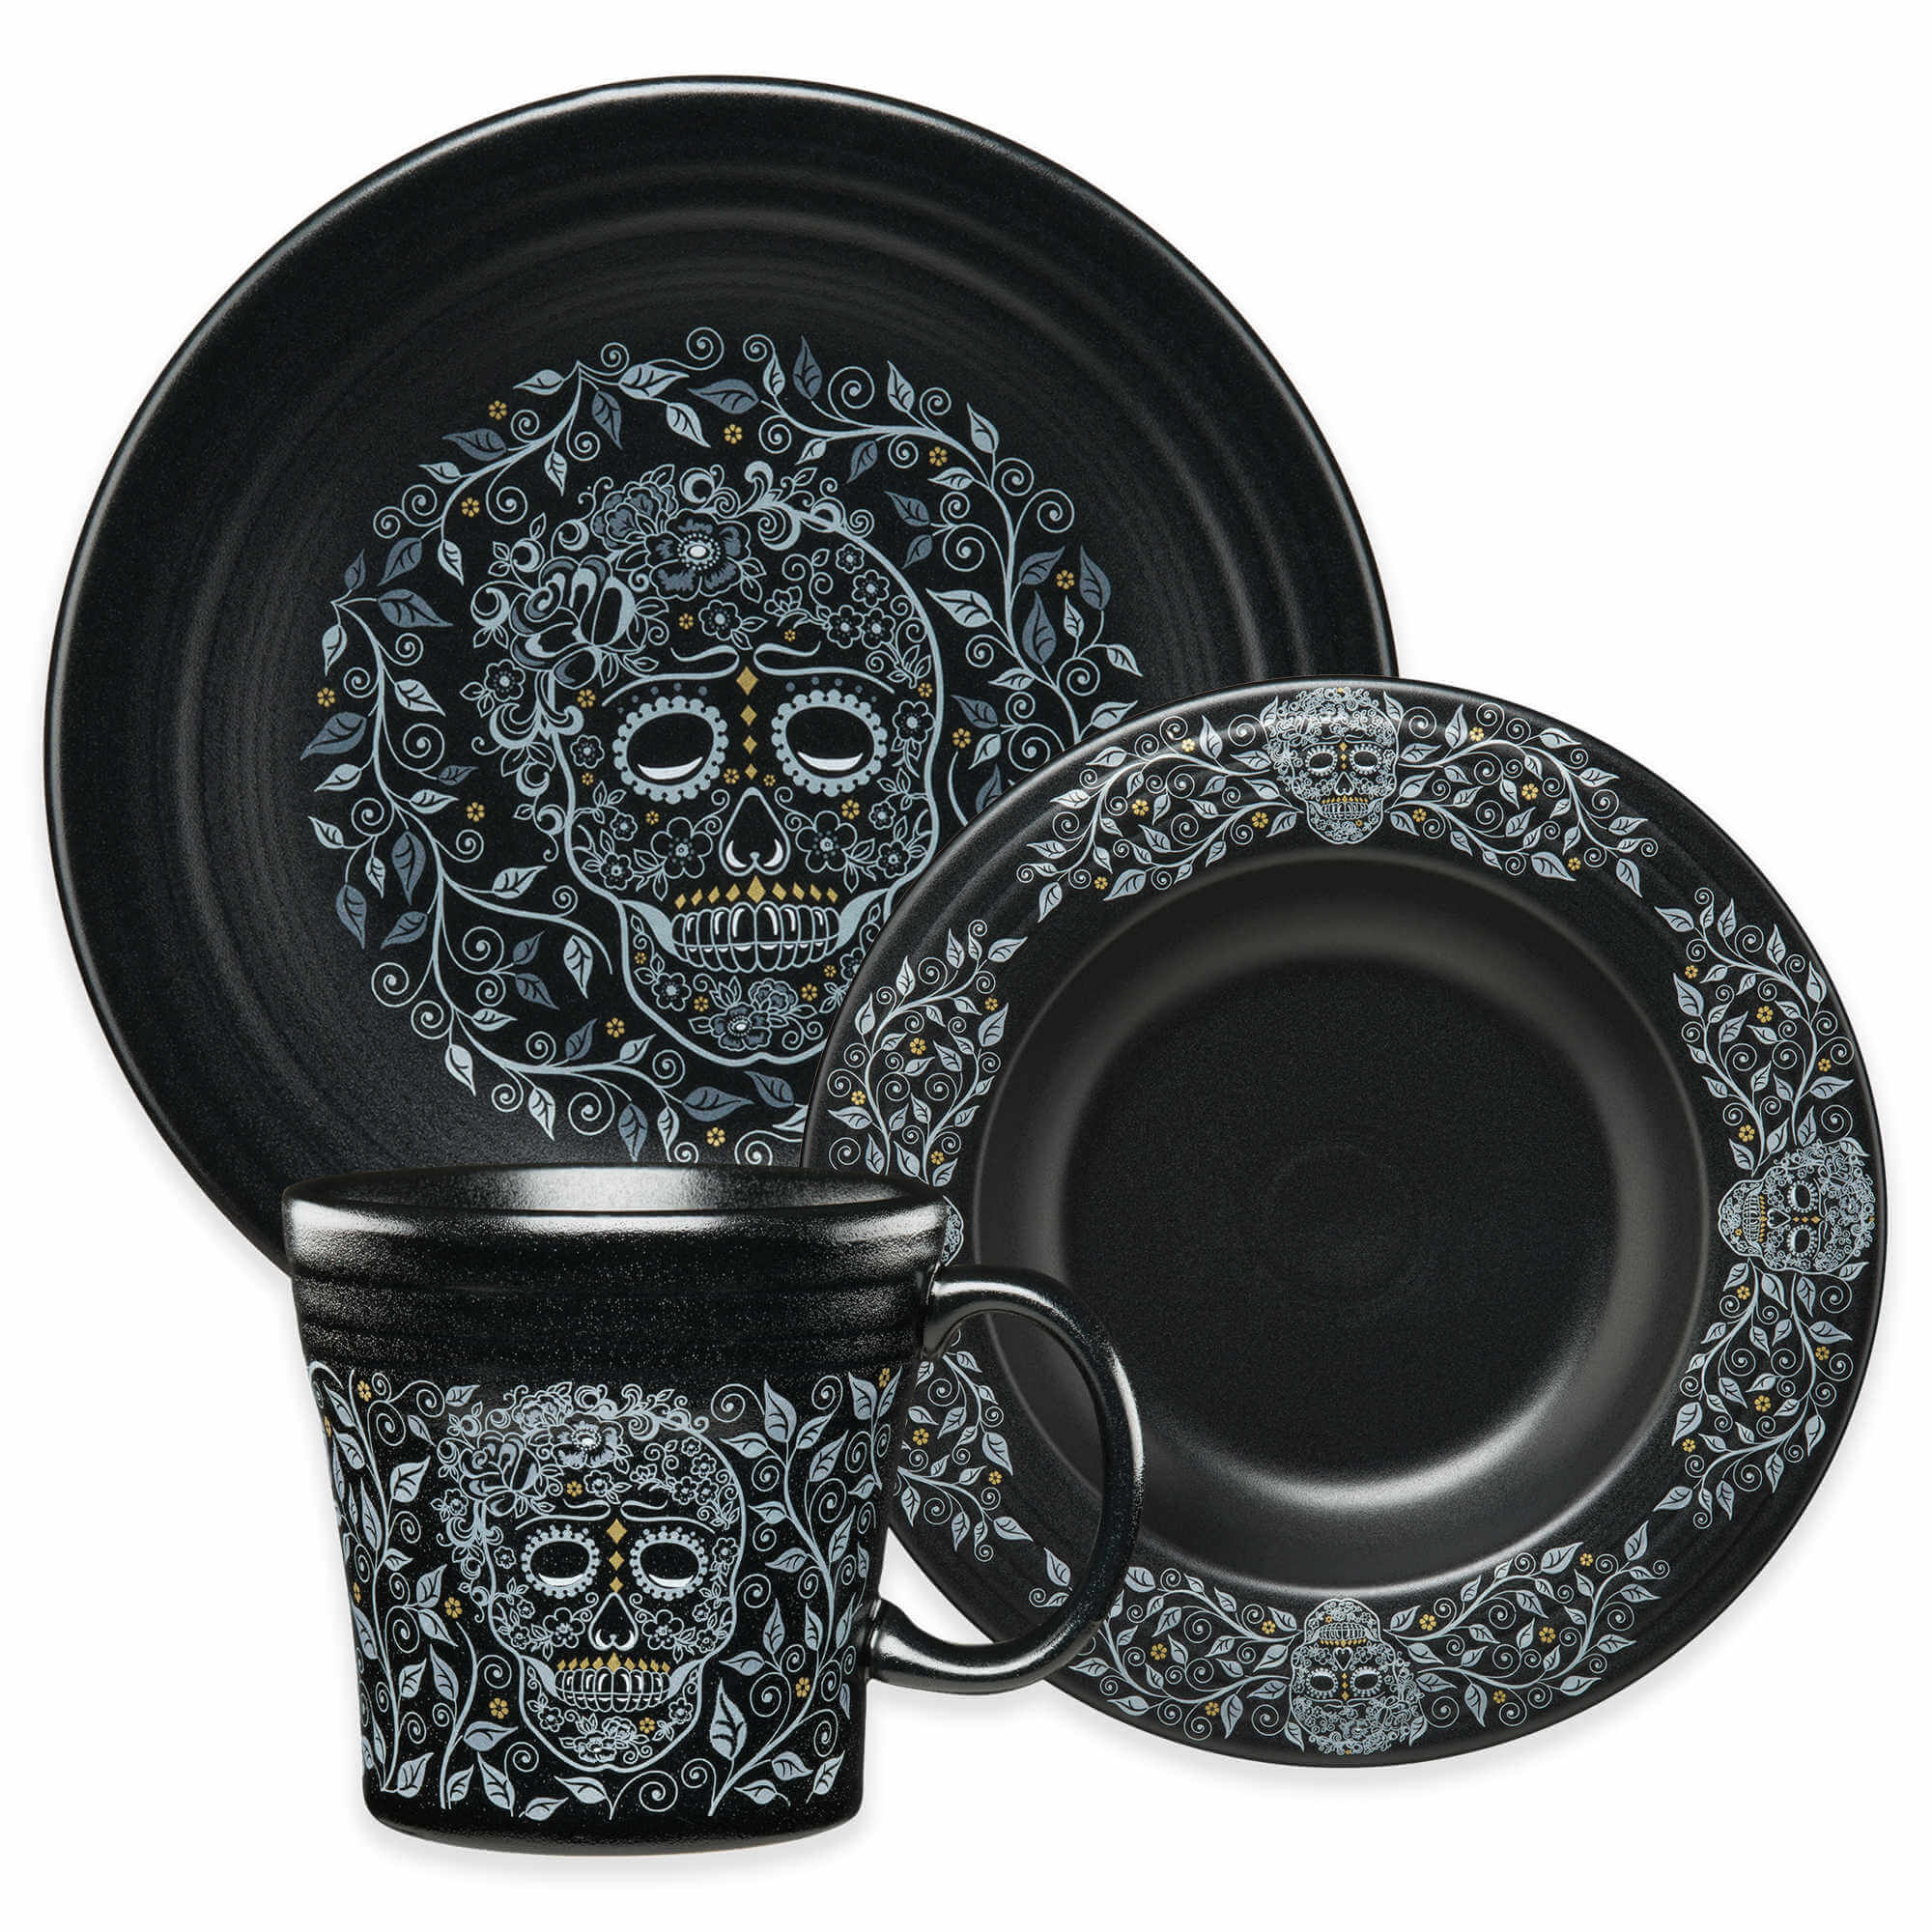 Fiesta Skull and Vine Dinnerware Collection in Black